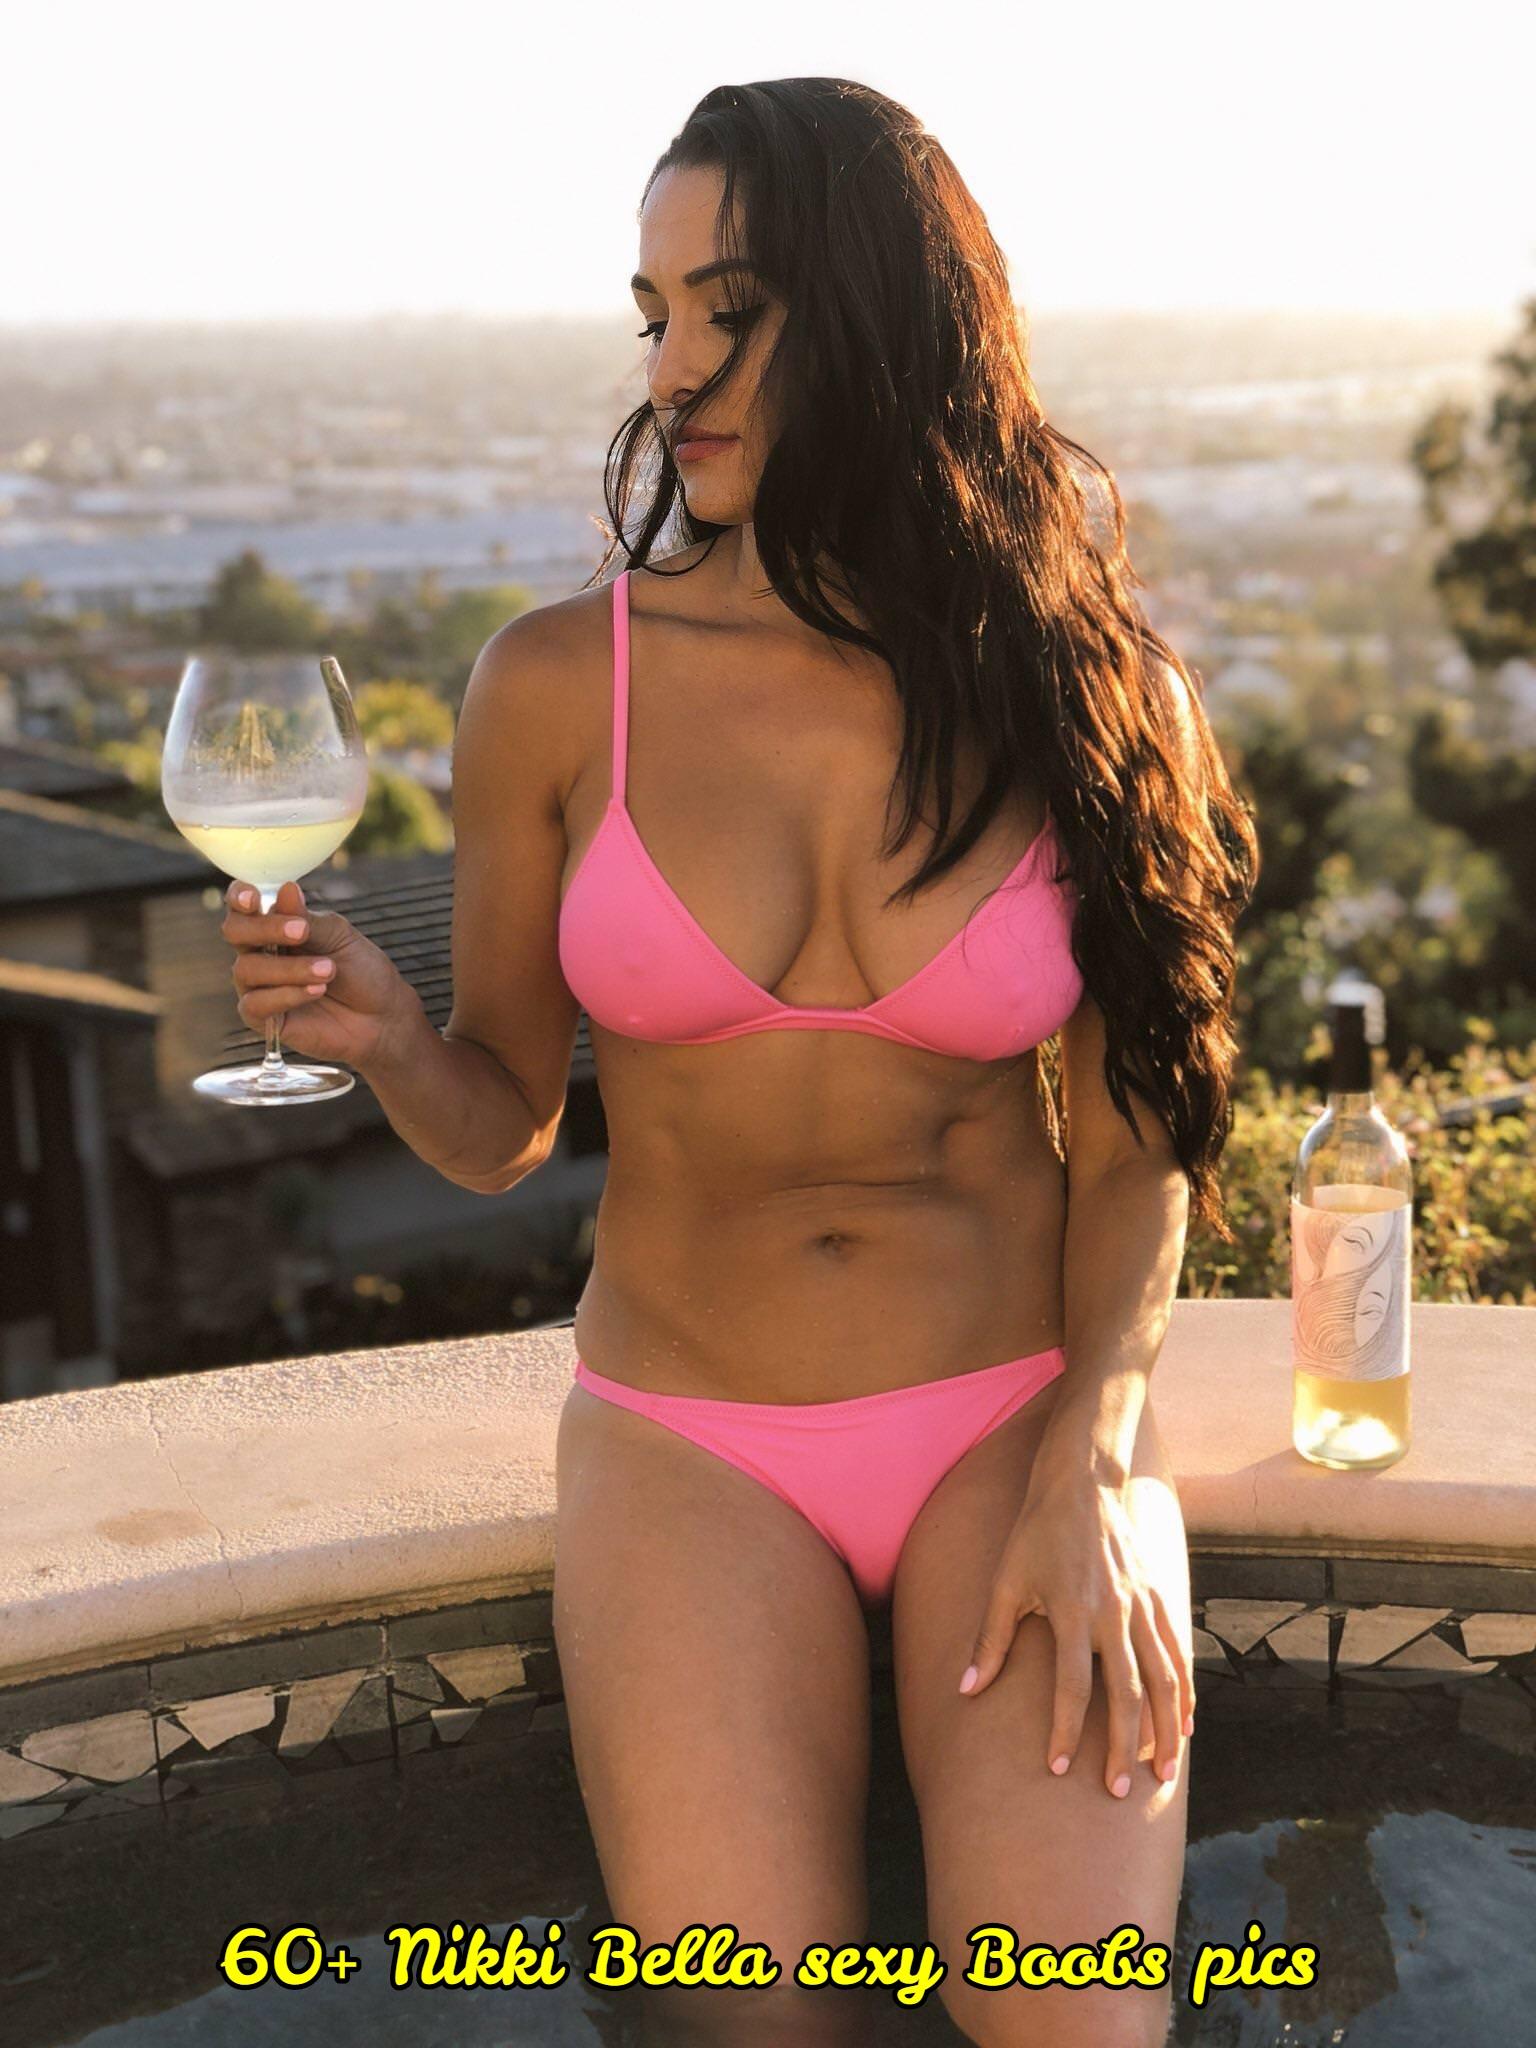 Nikki Bella sexy pictures